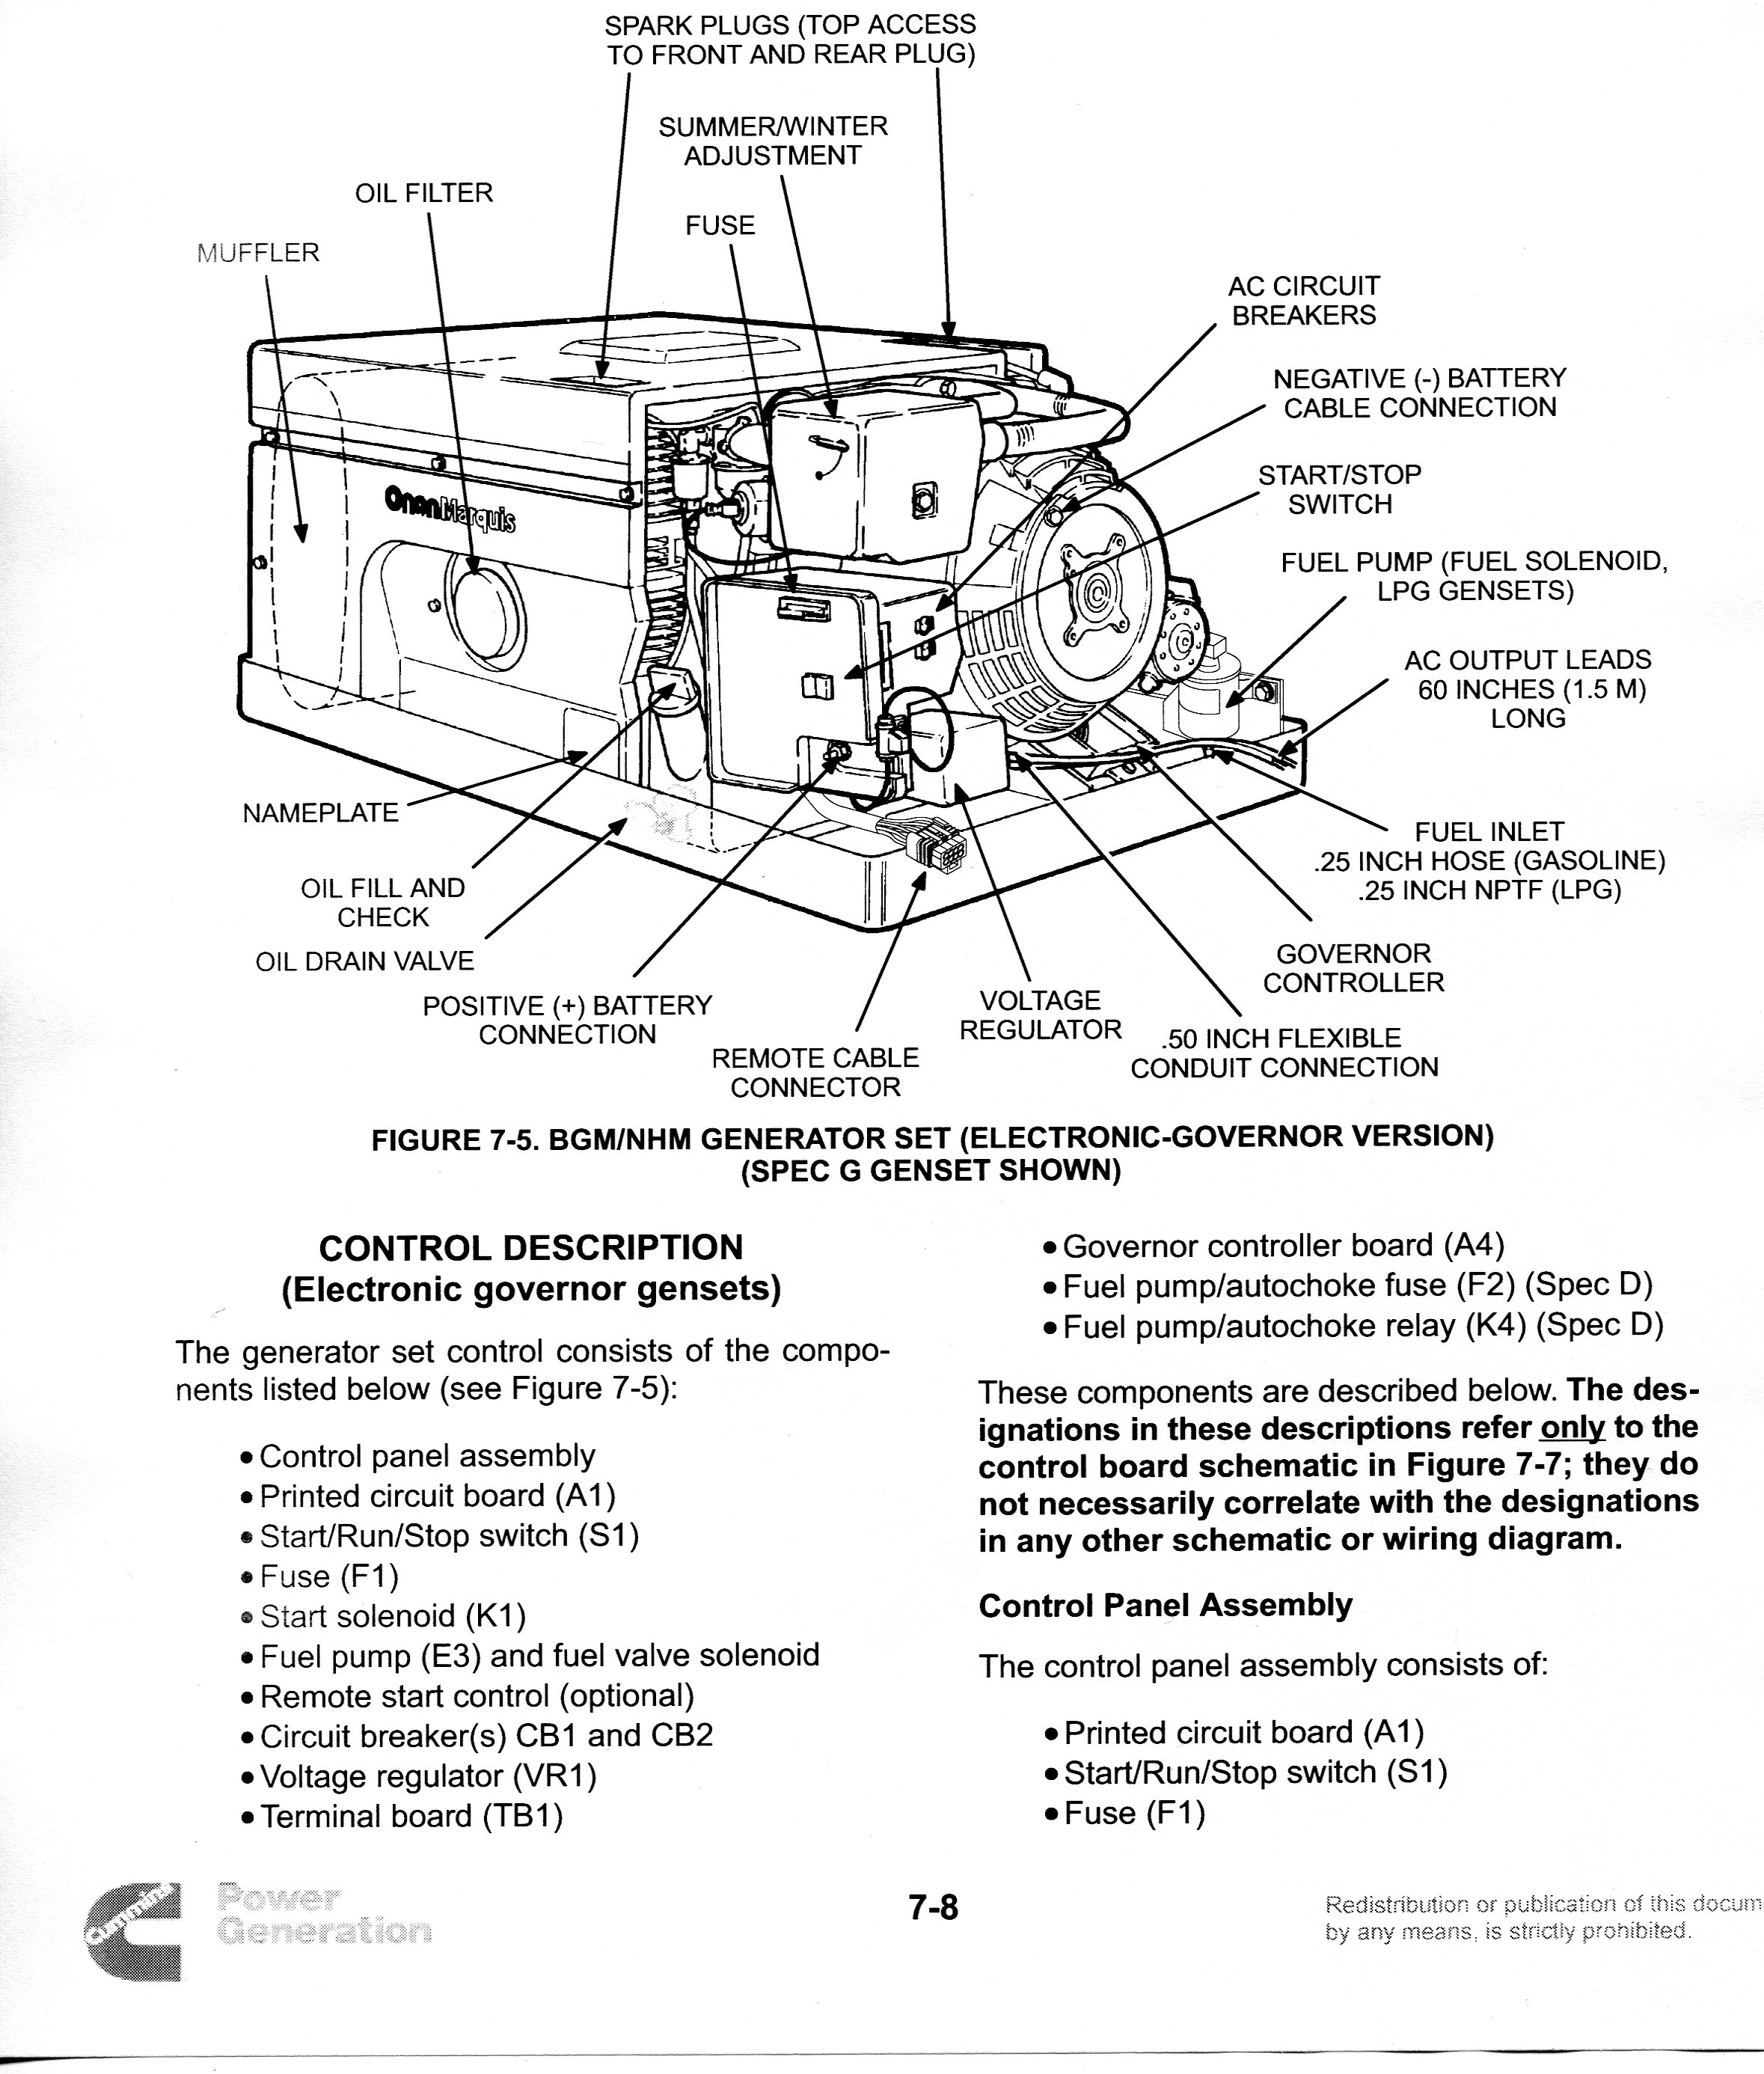 Onan Marquis 5500 Wiring Diagram - Wiring Solutions